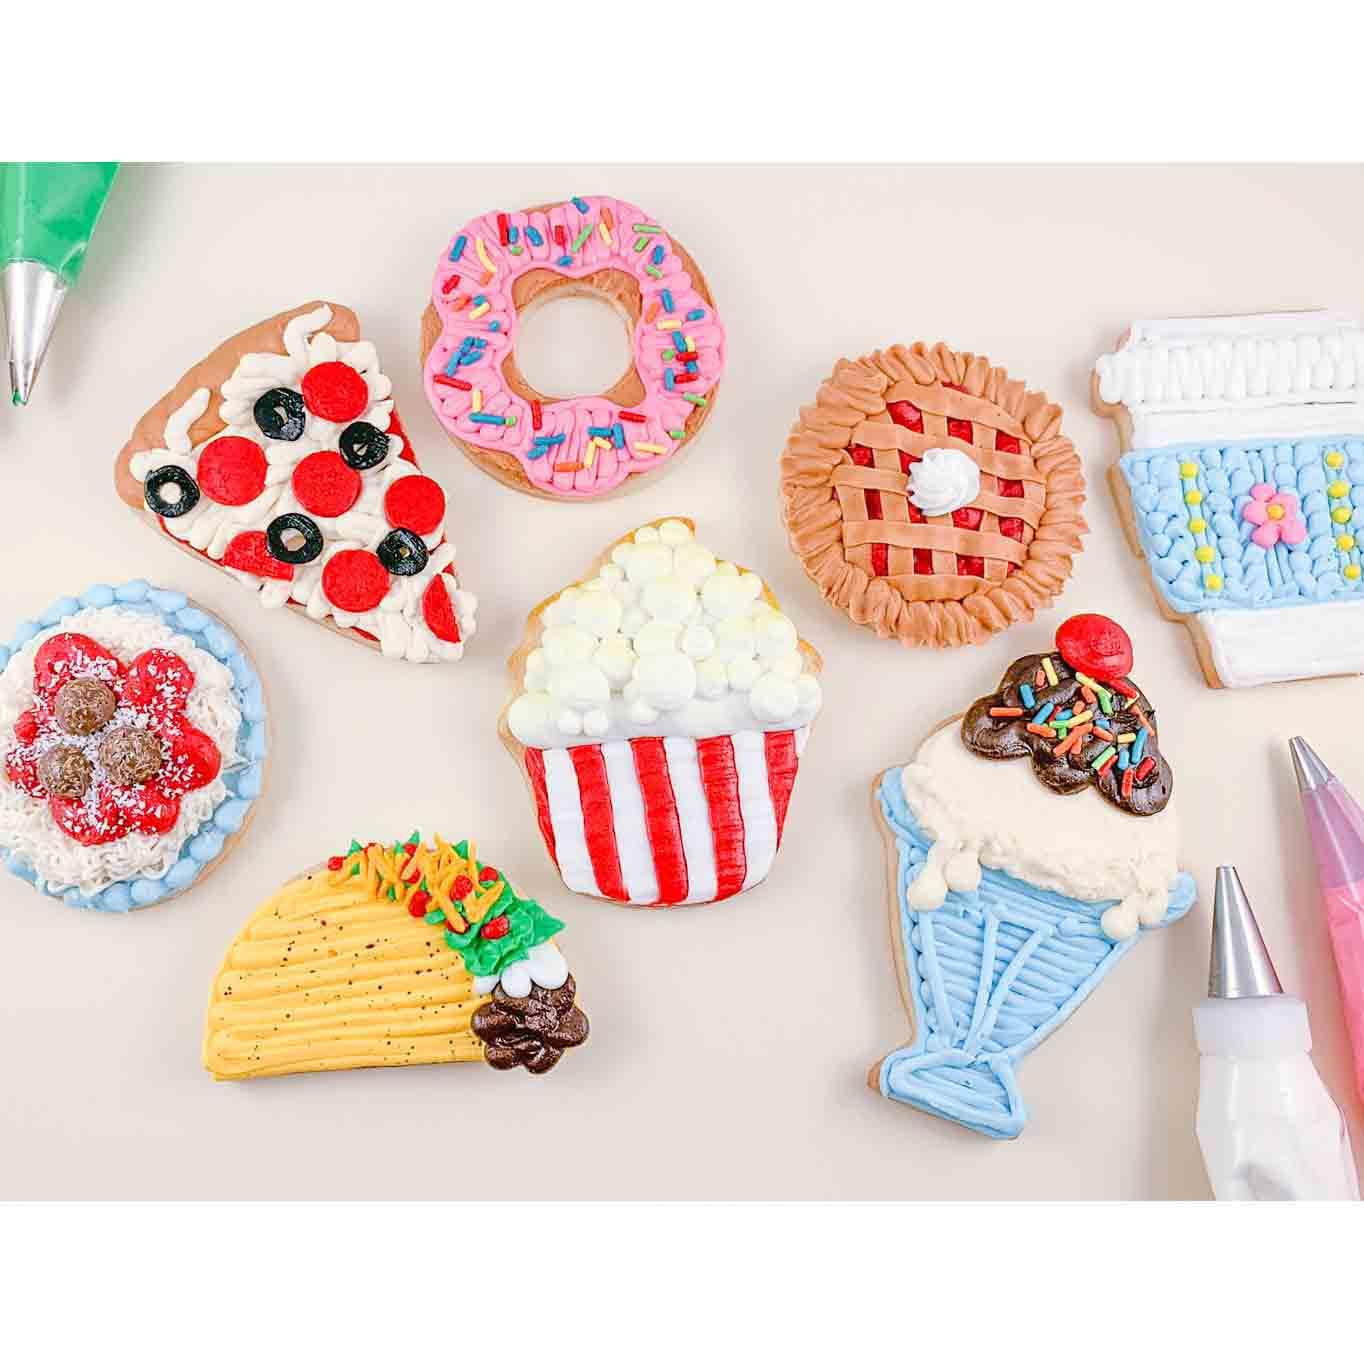 Fun Foods Cookie Decorating Kit